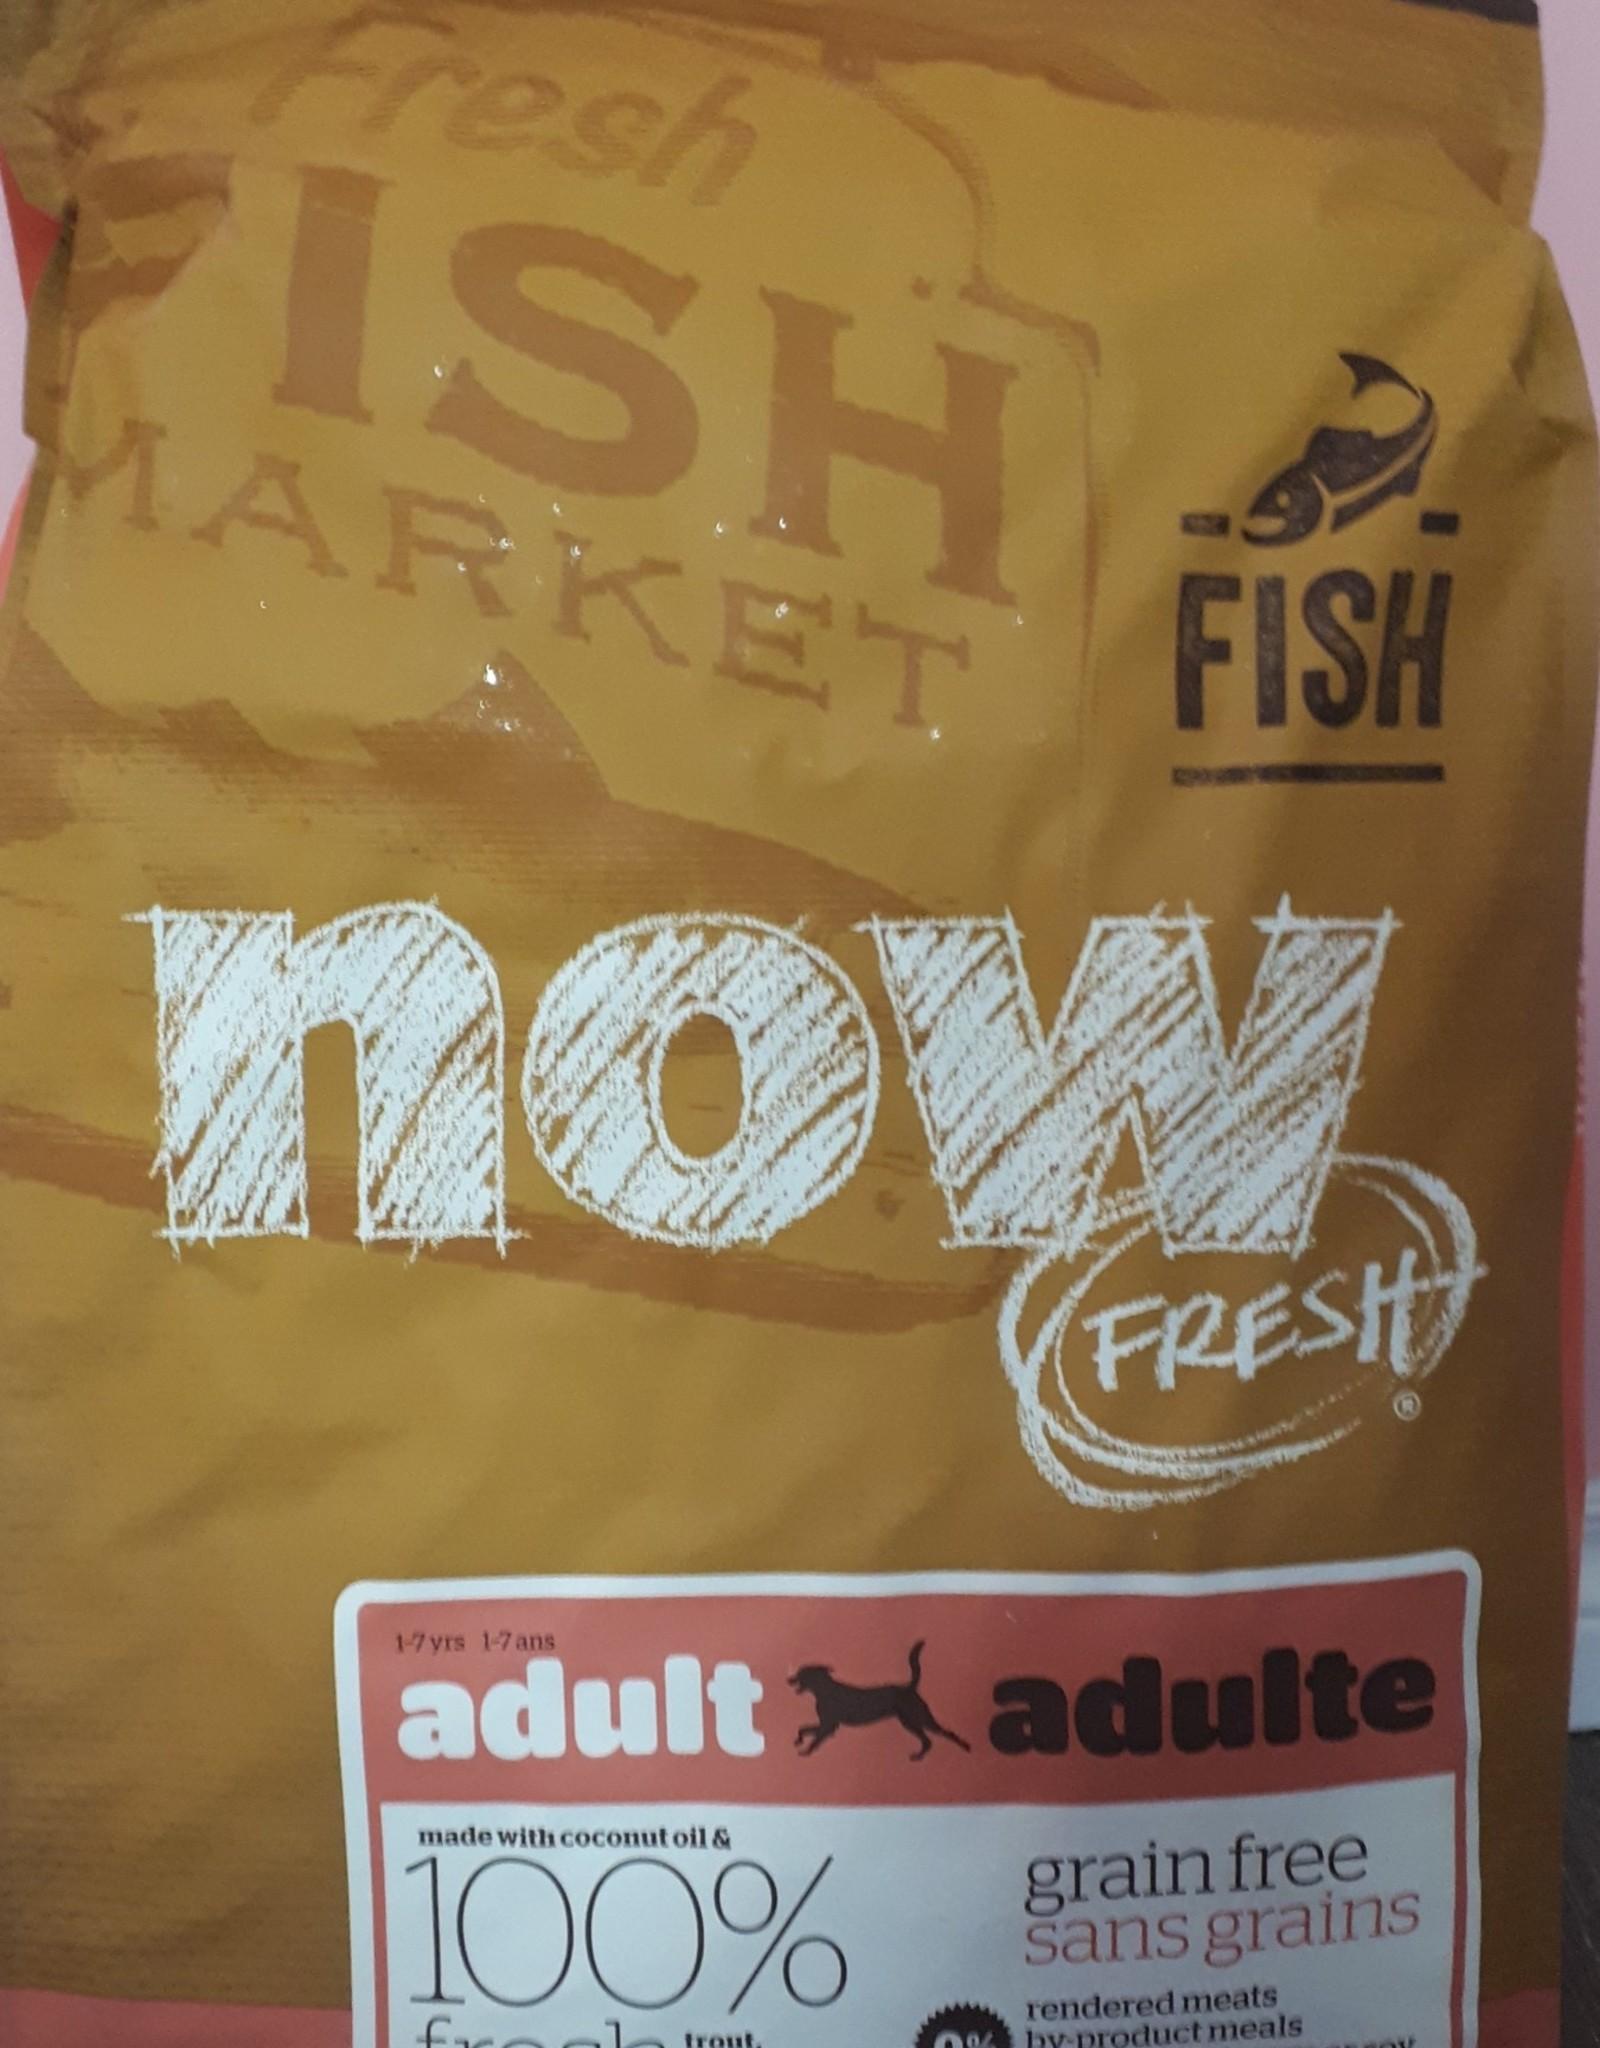 Now Fresh GF fish 25lbs